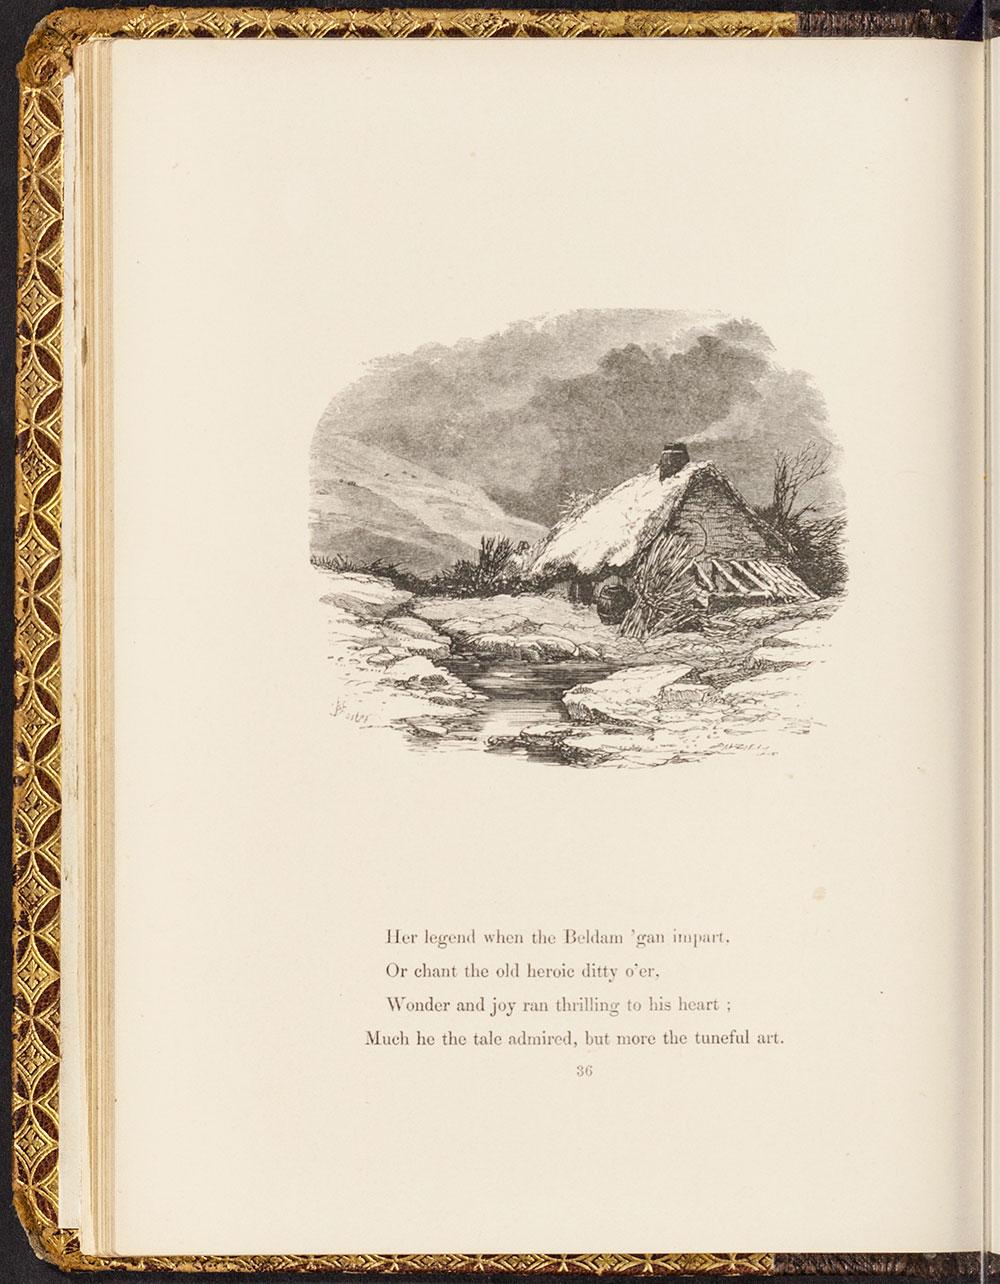 Myles Birket Foster. <i>The Minstrel.</i> London: George Routledge & Co., 1858.